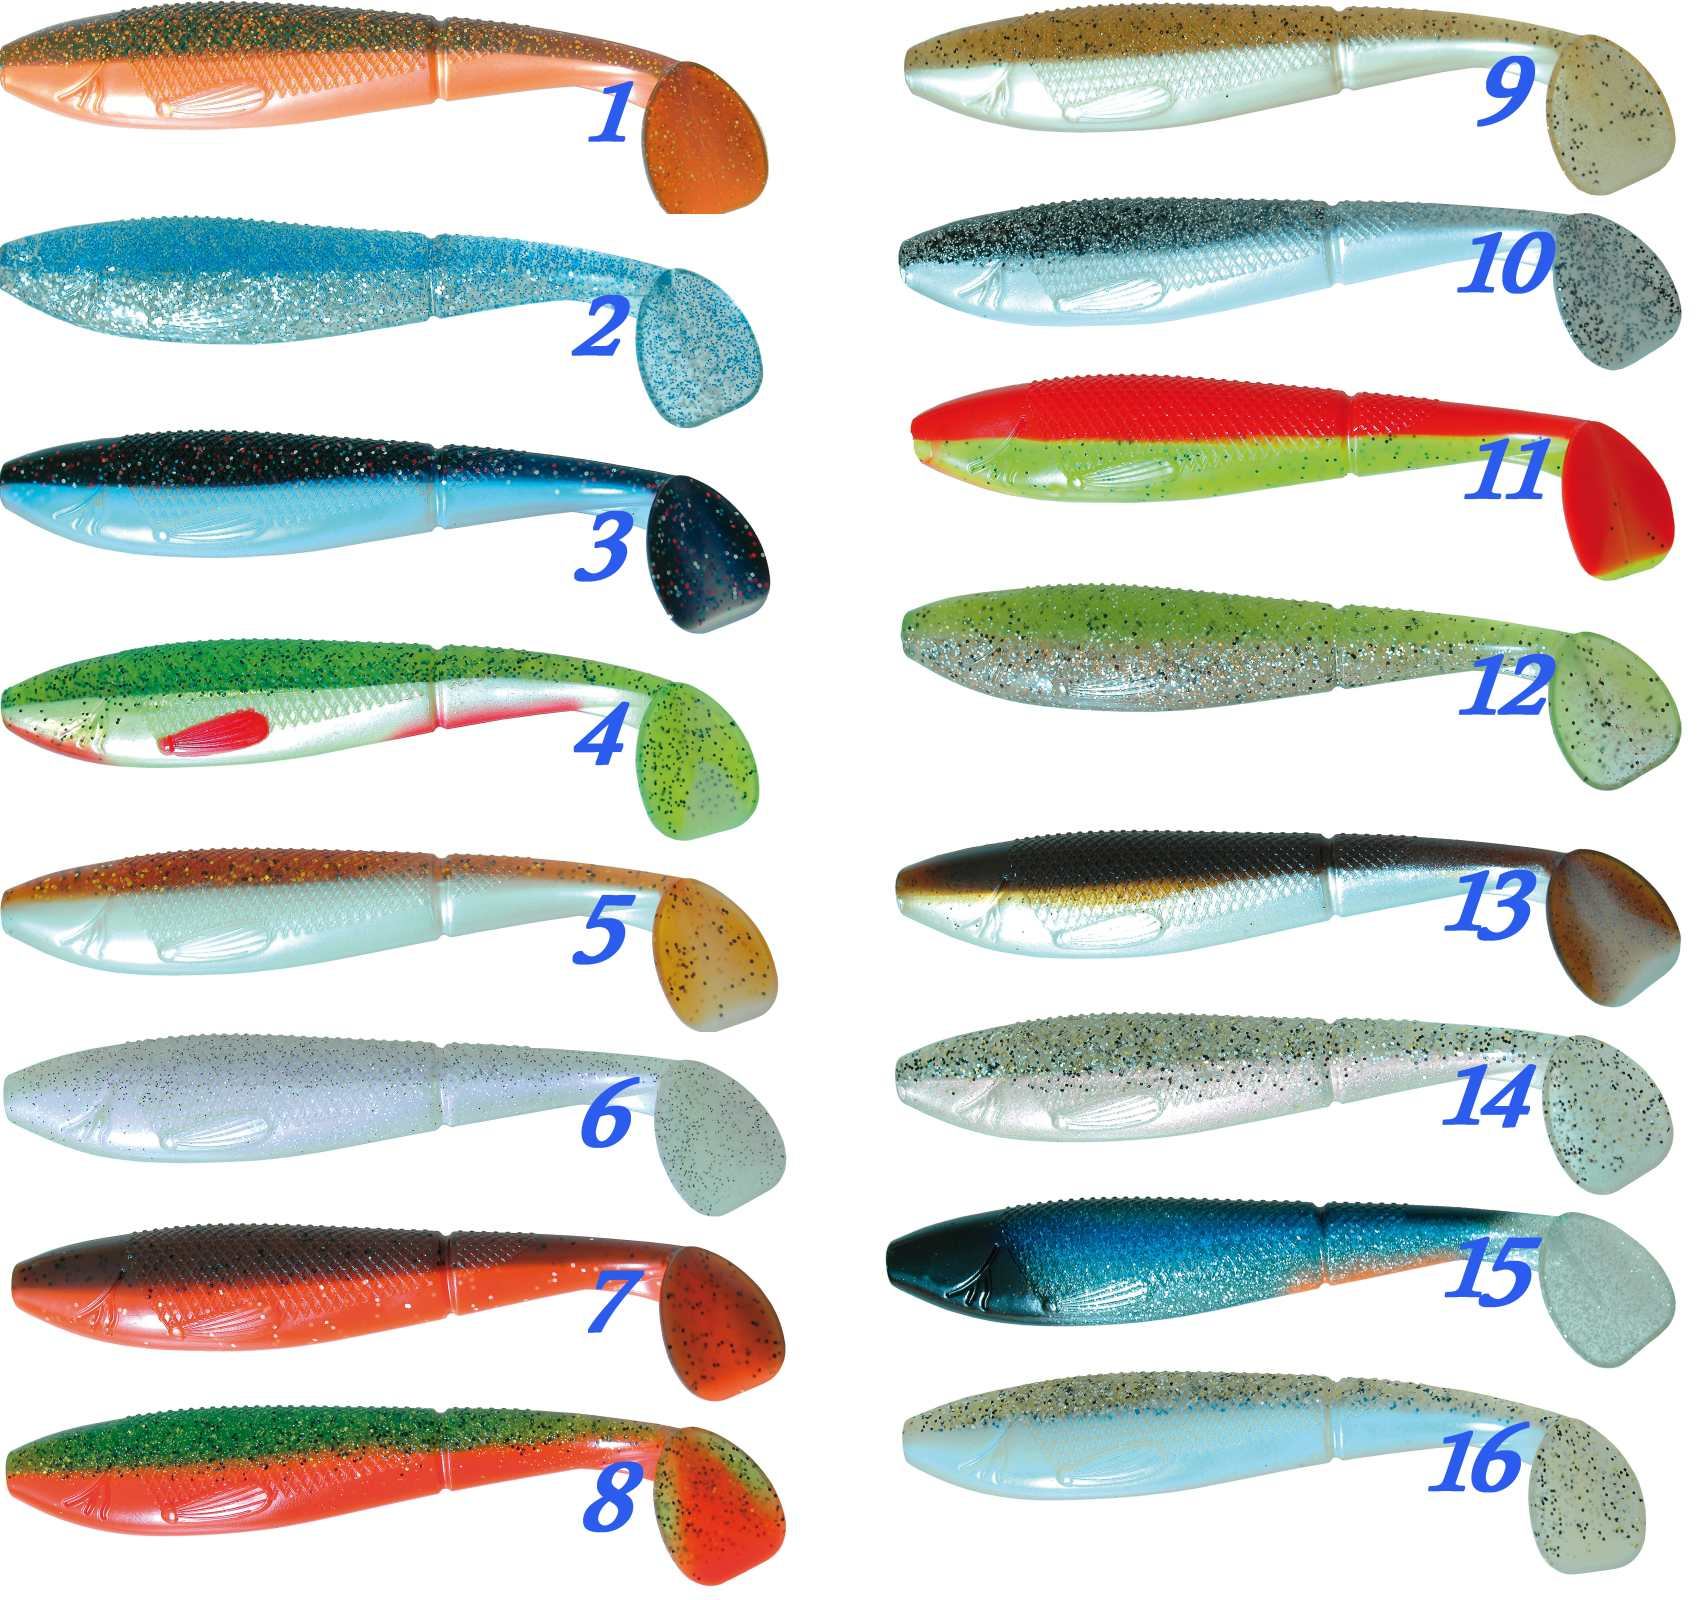 Gumová nástraha Atoka Scaler 24cm / 2ks rybí aroma, riper - zvìtšit obrázek